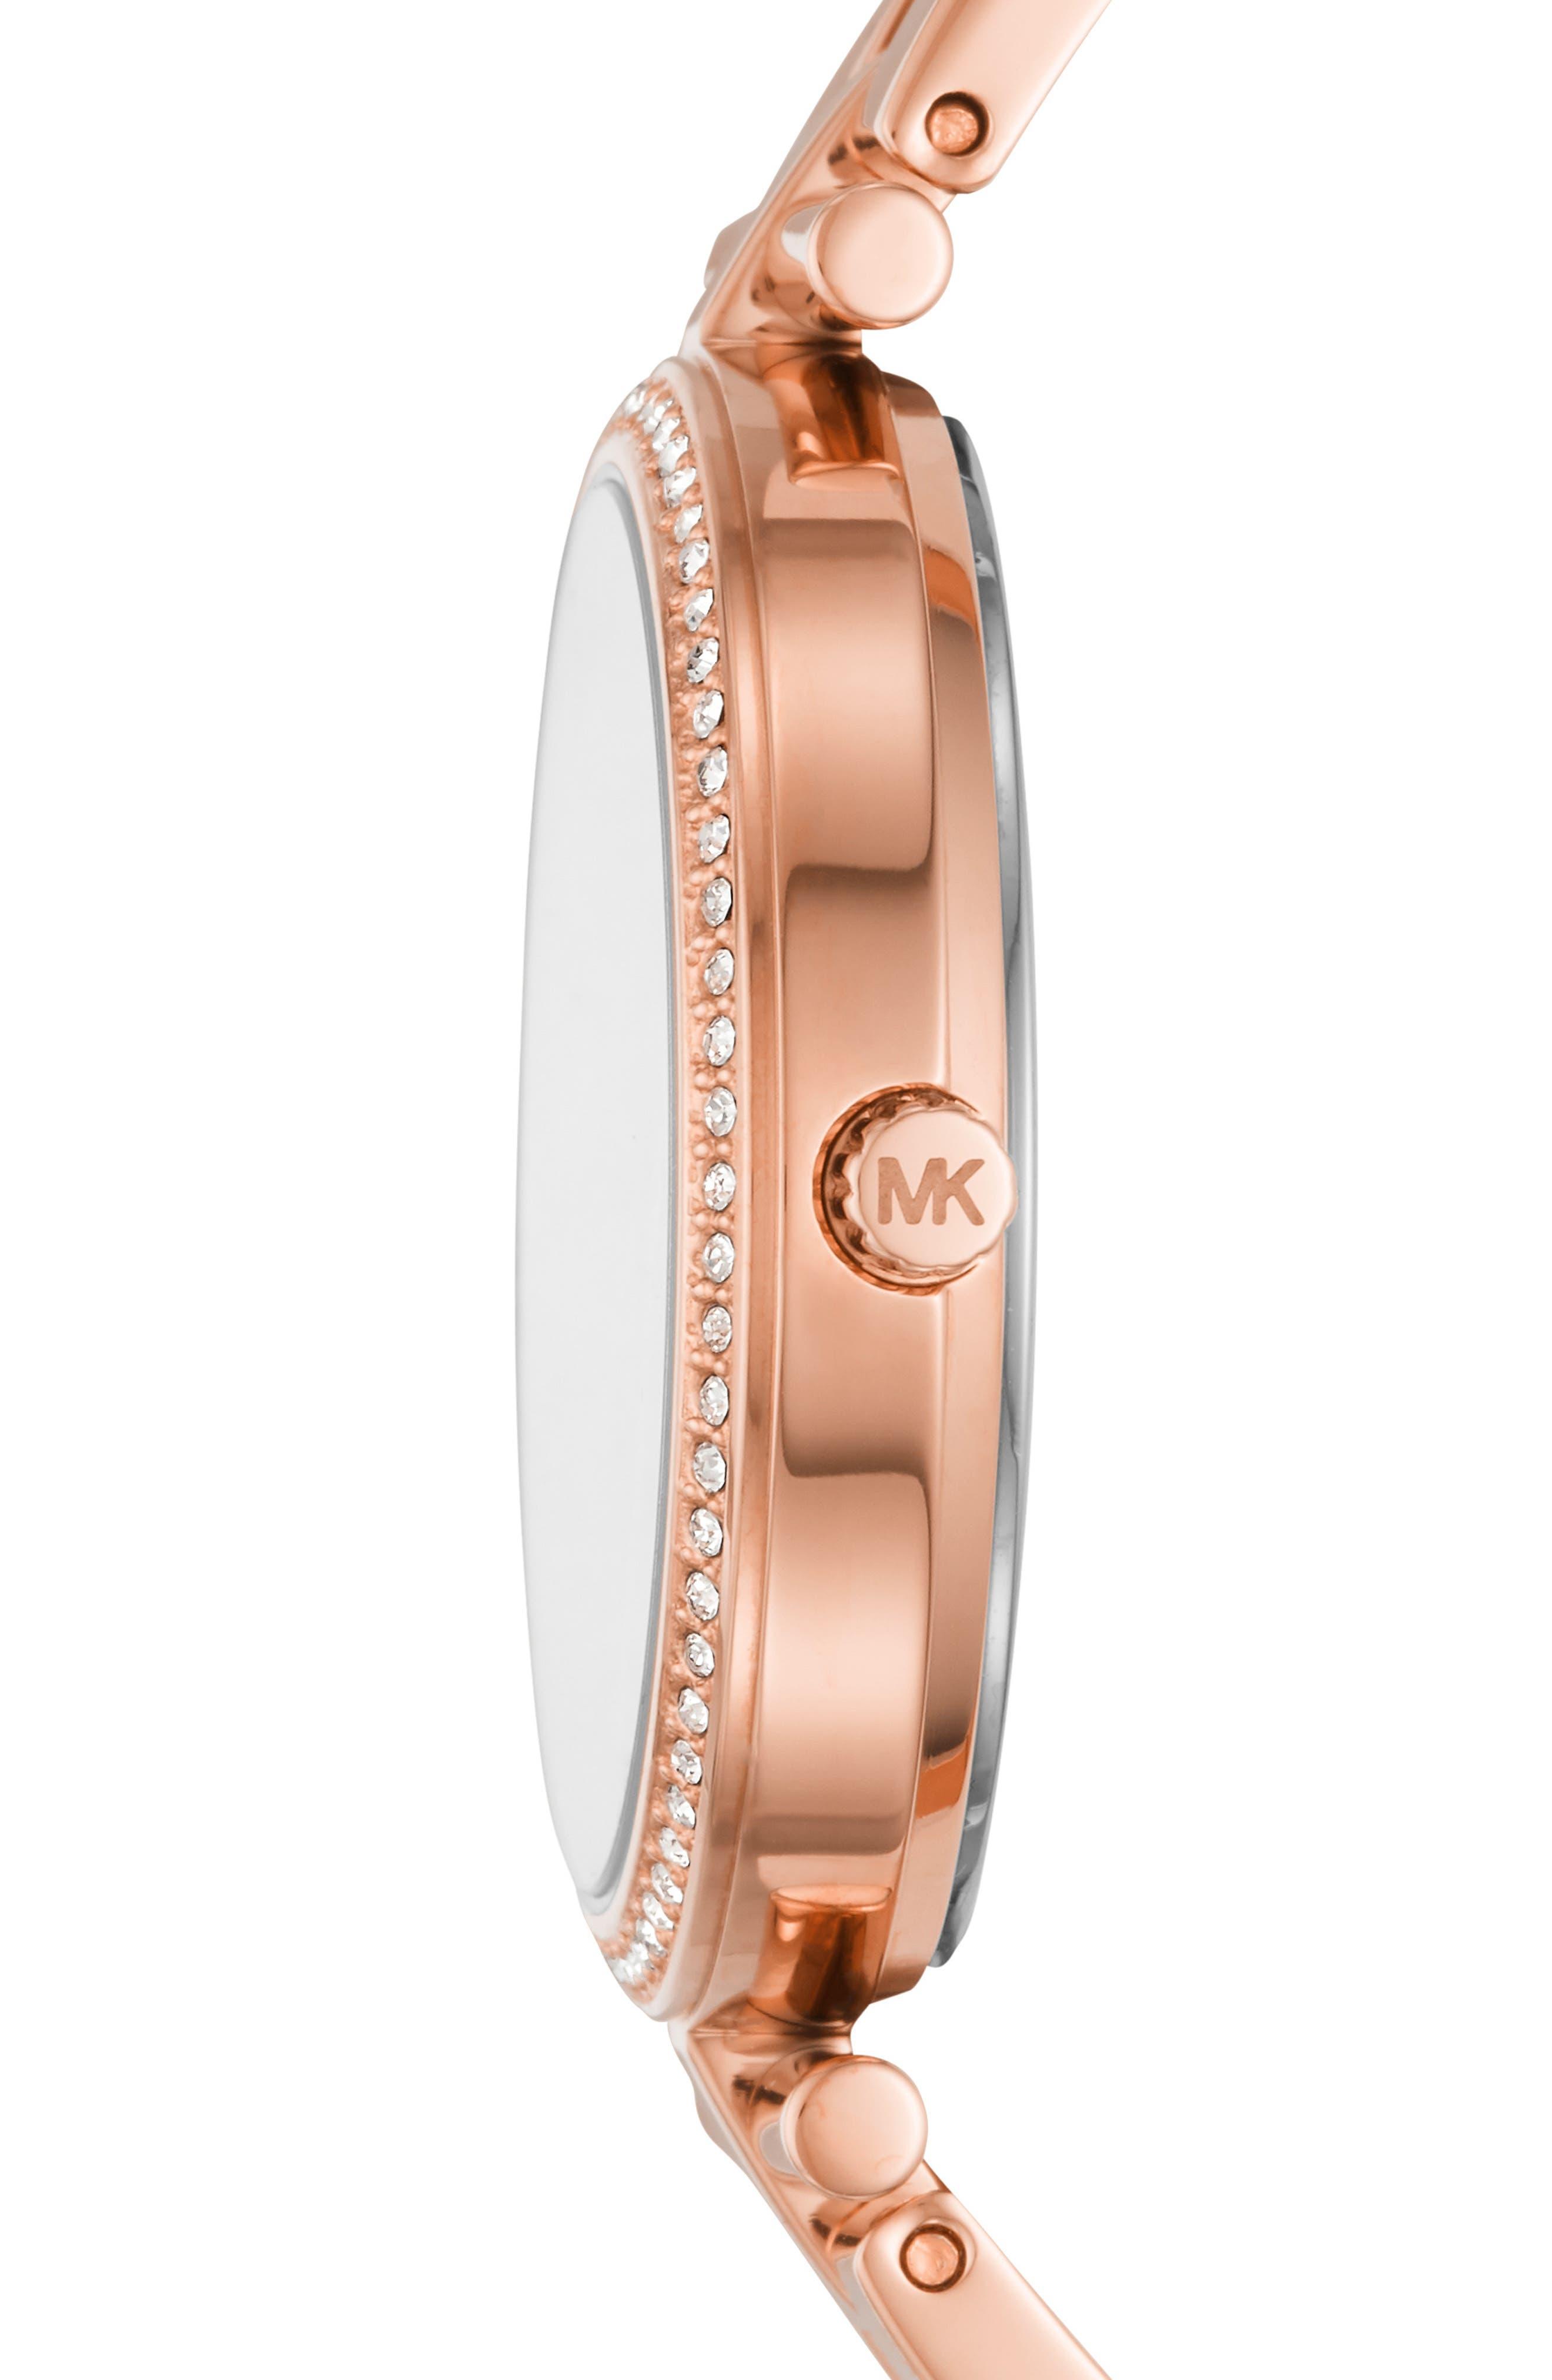 MICHAEL KORS,                             Maci Bracelet Watch, 34mm,                             Alternate thumbnail 2, color,                             ROSE GOLD